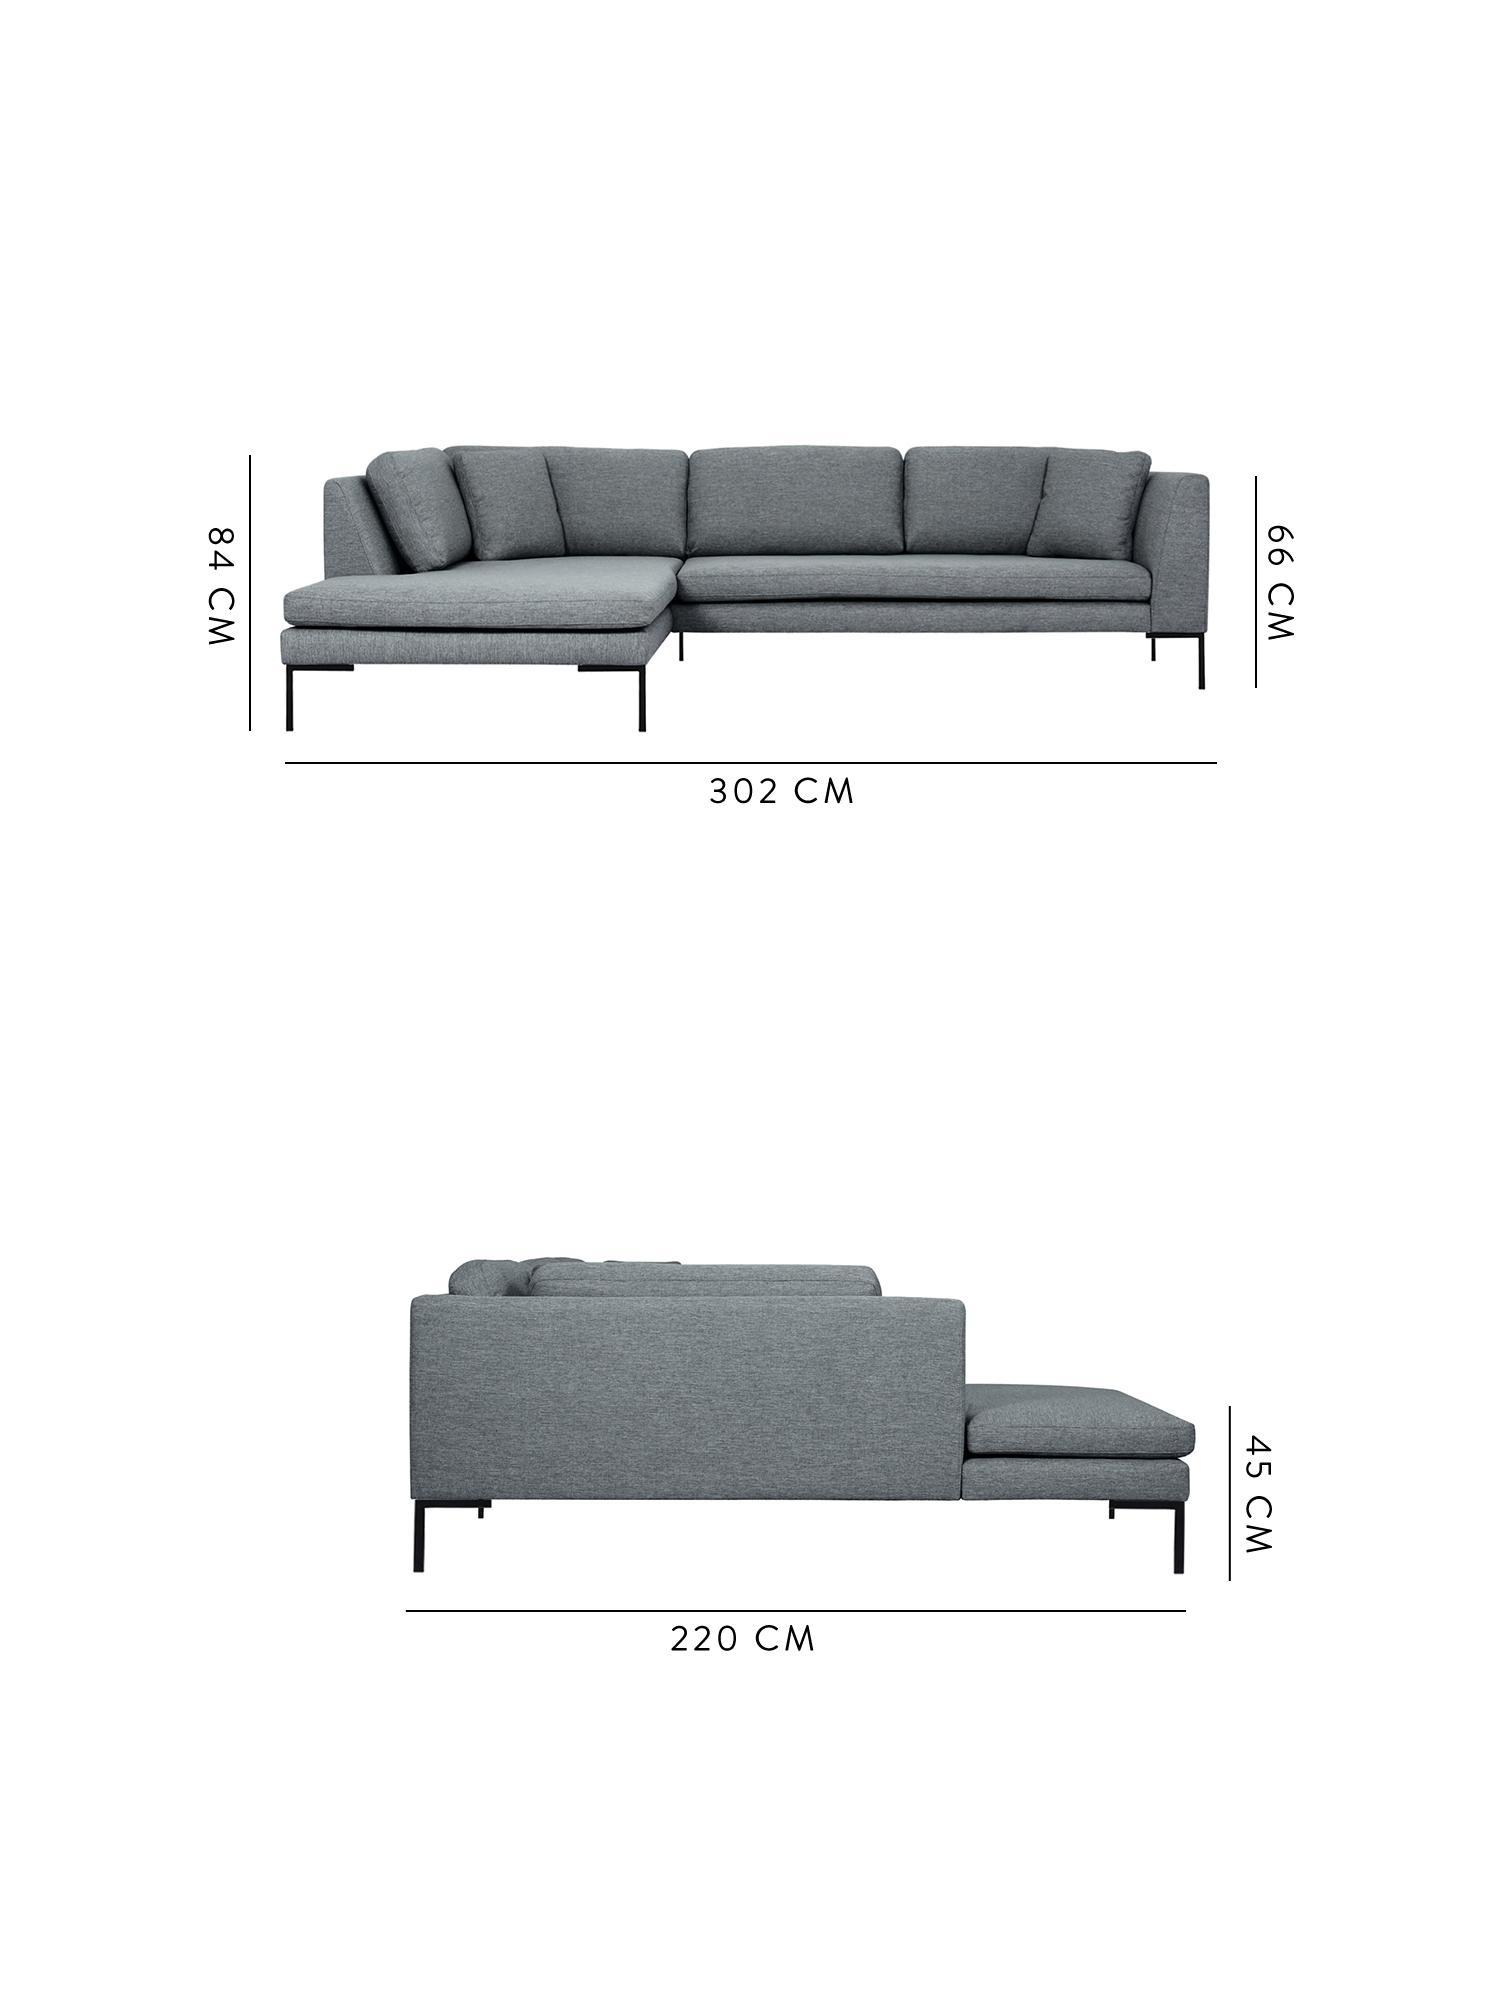 Ecksofa Emma, Bezug: Polyester 100.000 Scheuer, Gestell: Massives Kiefernholz, Webstoff Grau, Füsse Schwarz, B 302 x T 220 cm